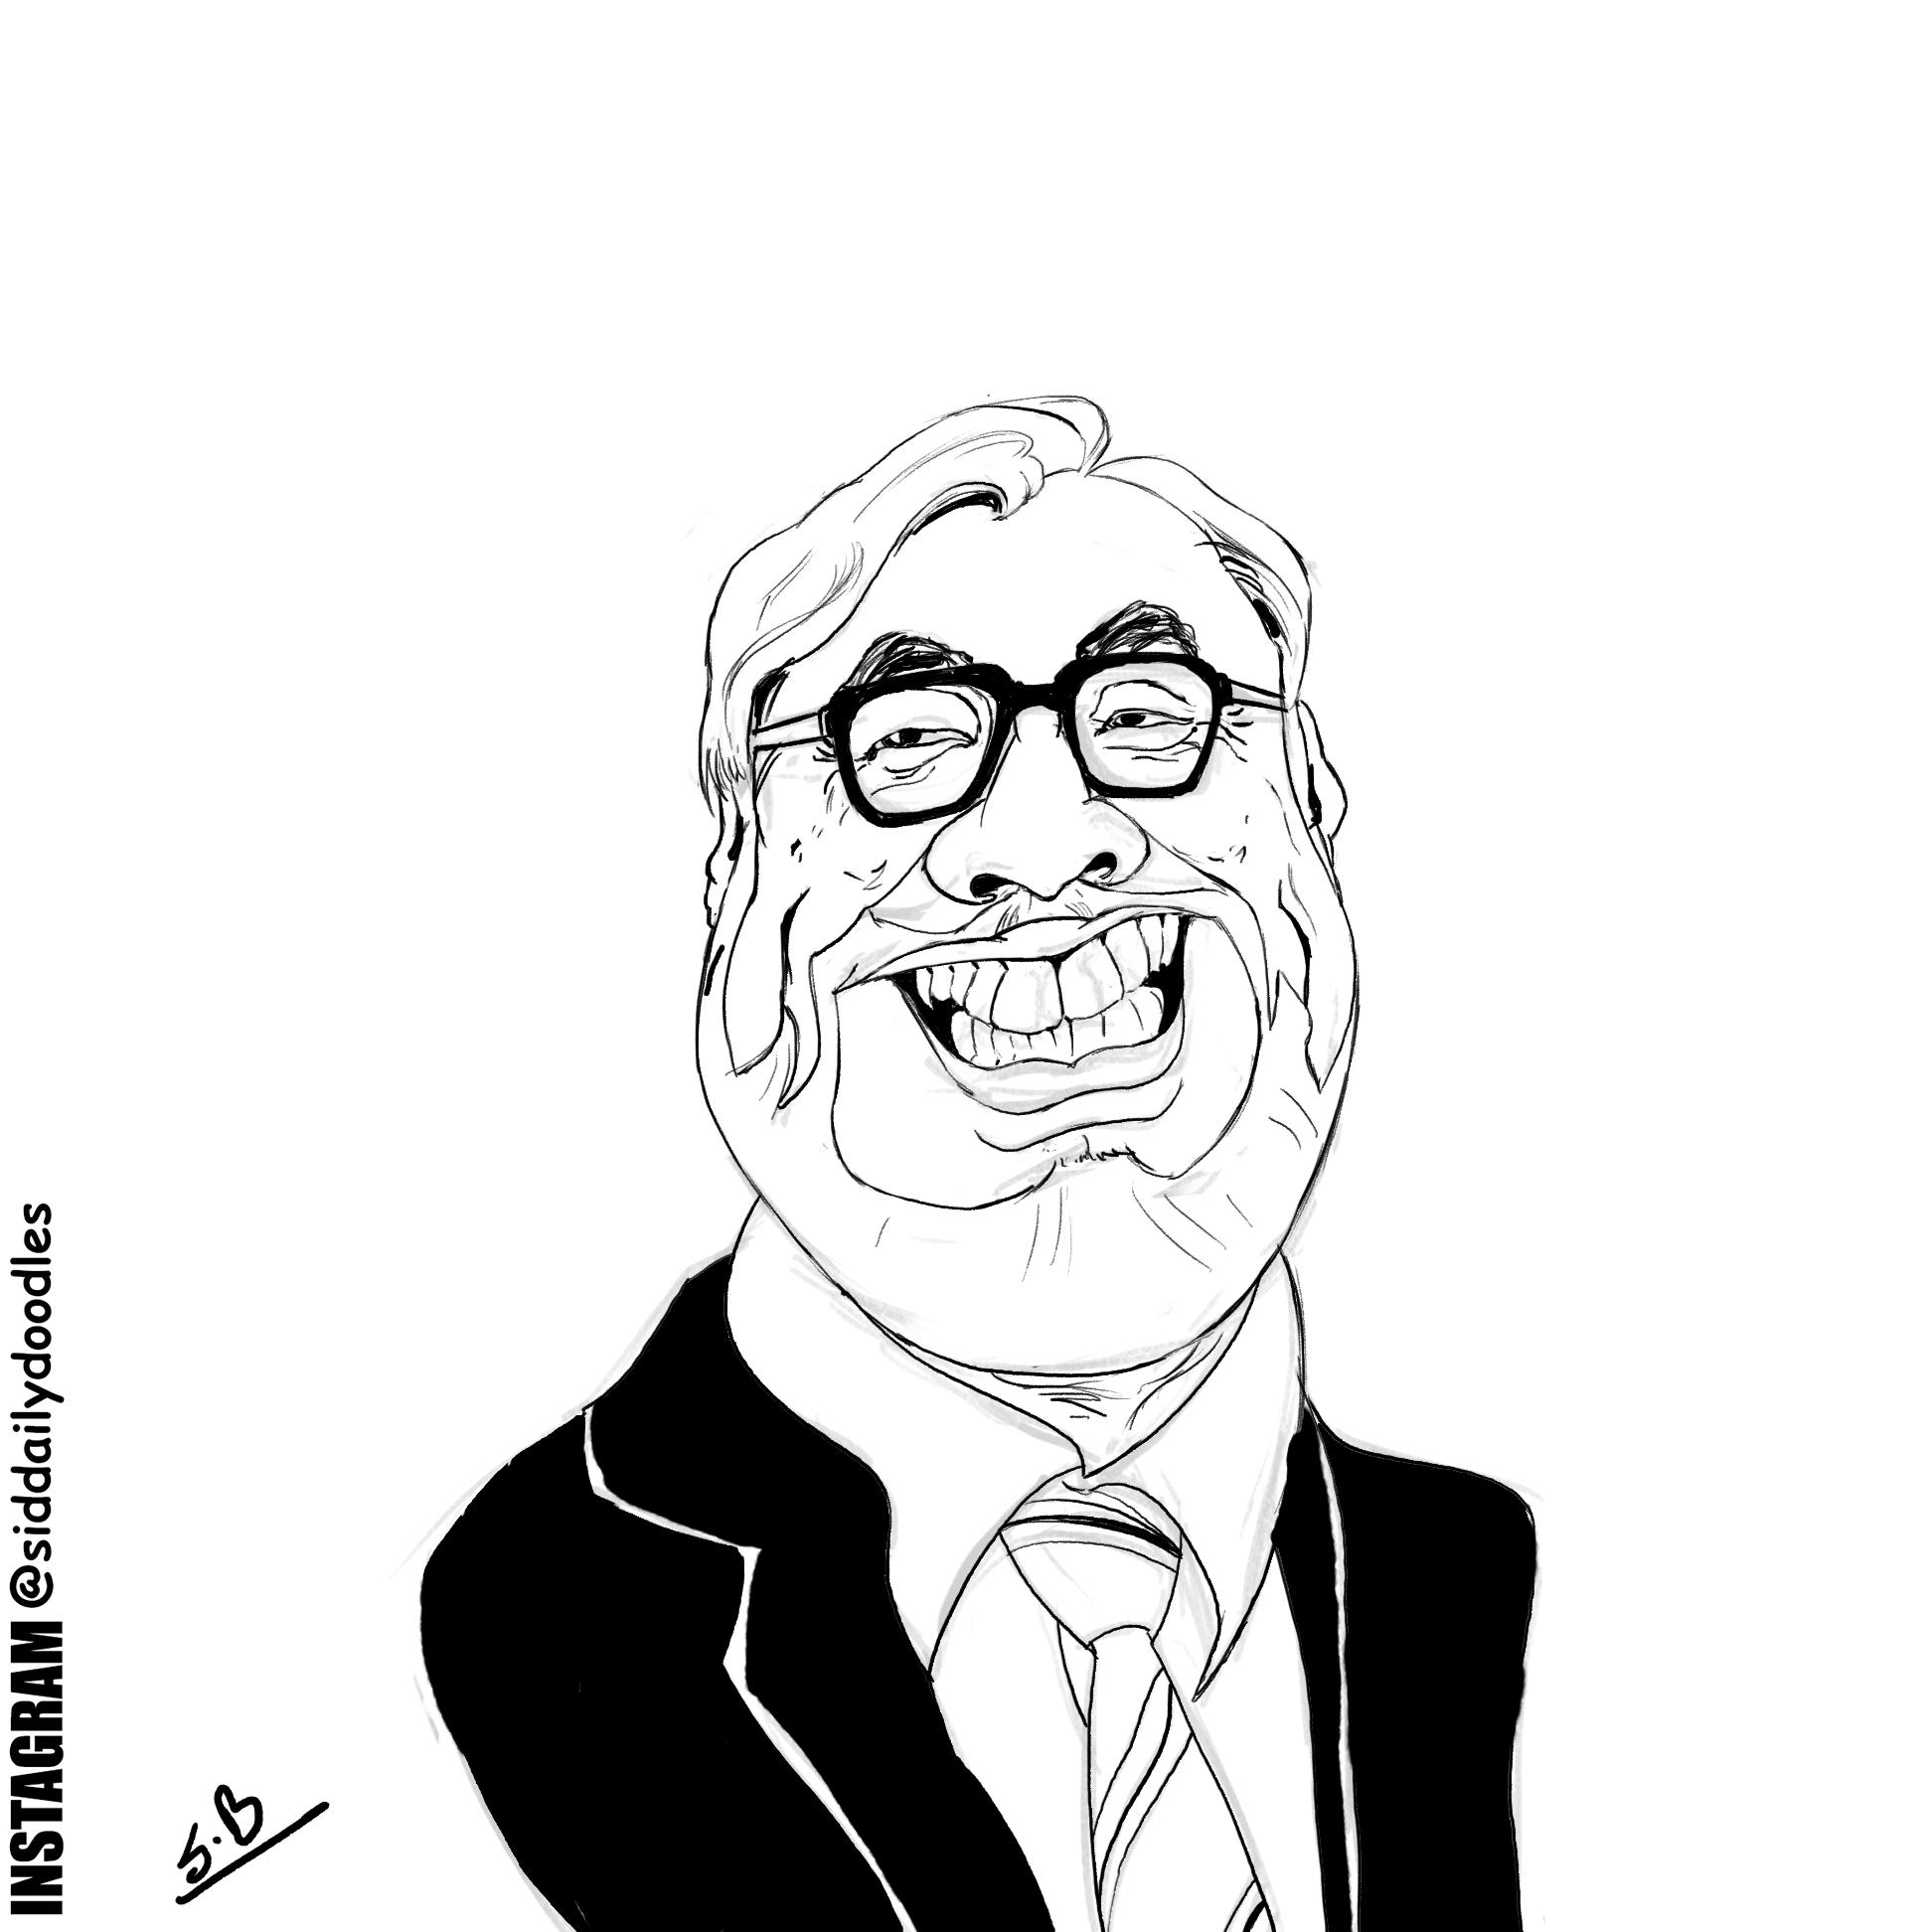 Hayao Miyazaki Caricature